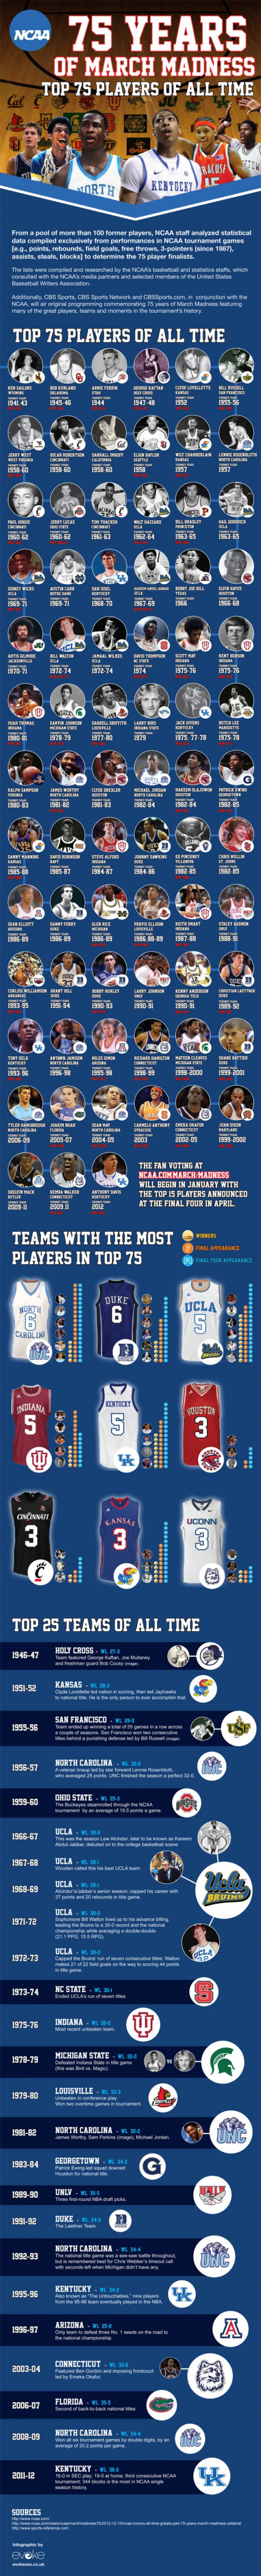 NCAA Top 75 Basketball Players of All Time